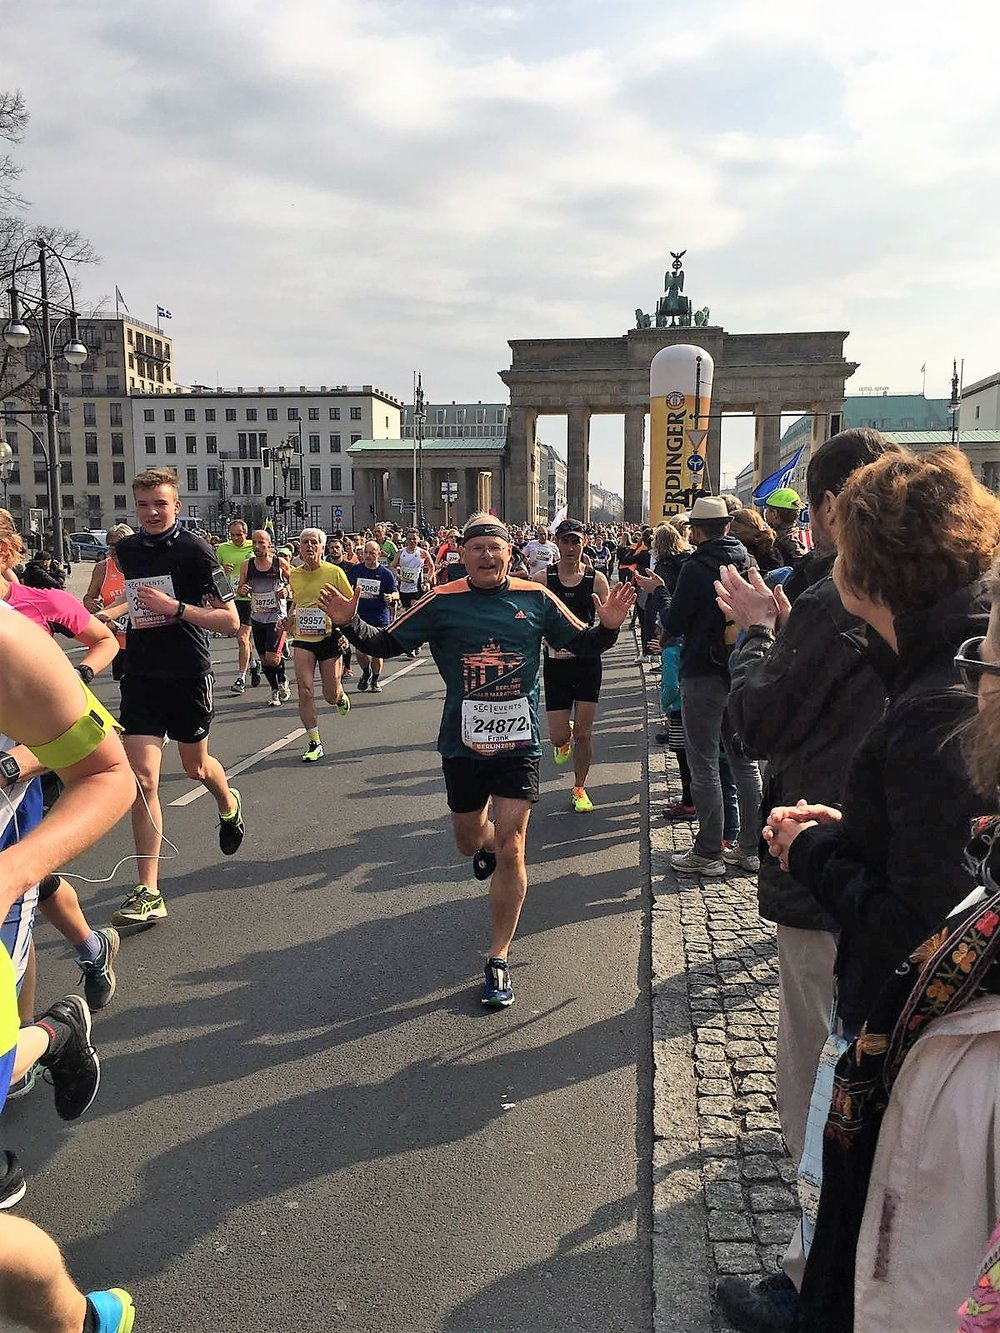 2017 Frank running through Brandenburger Gate in Berlin